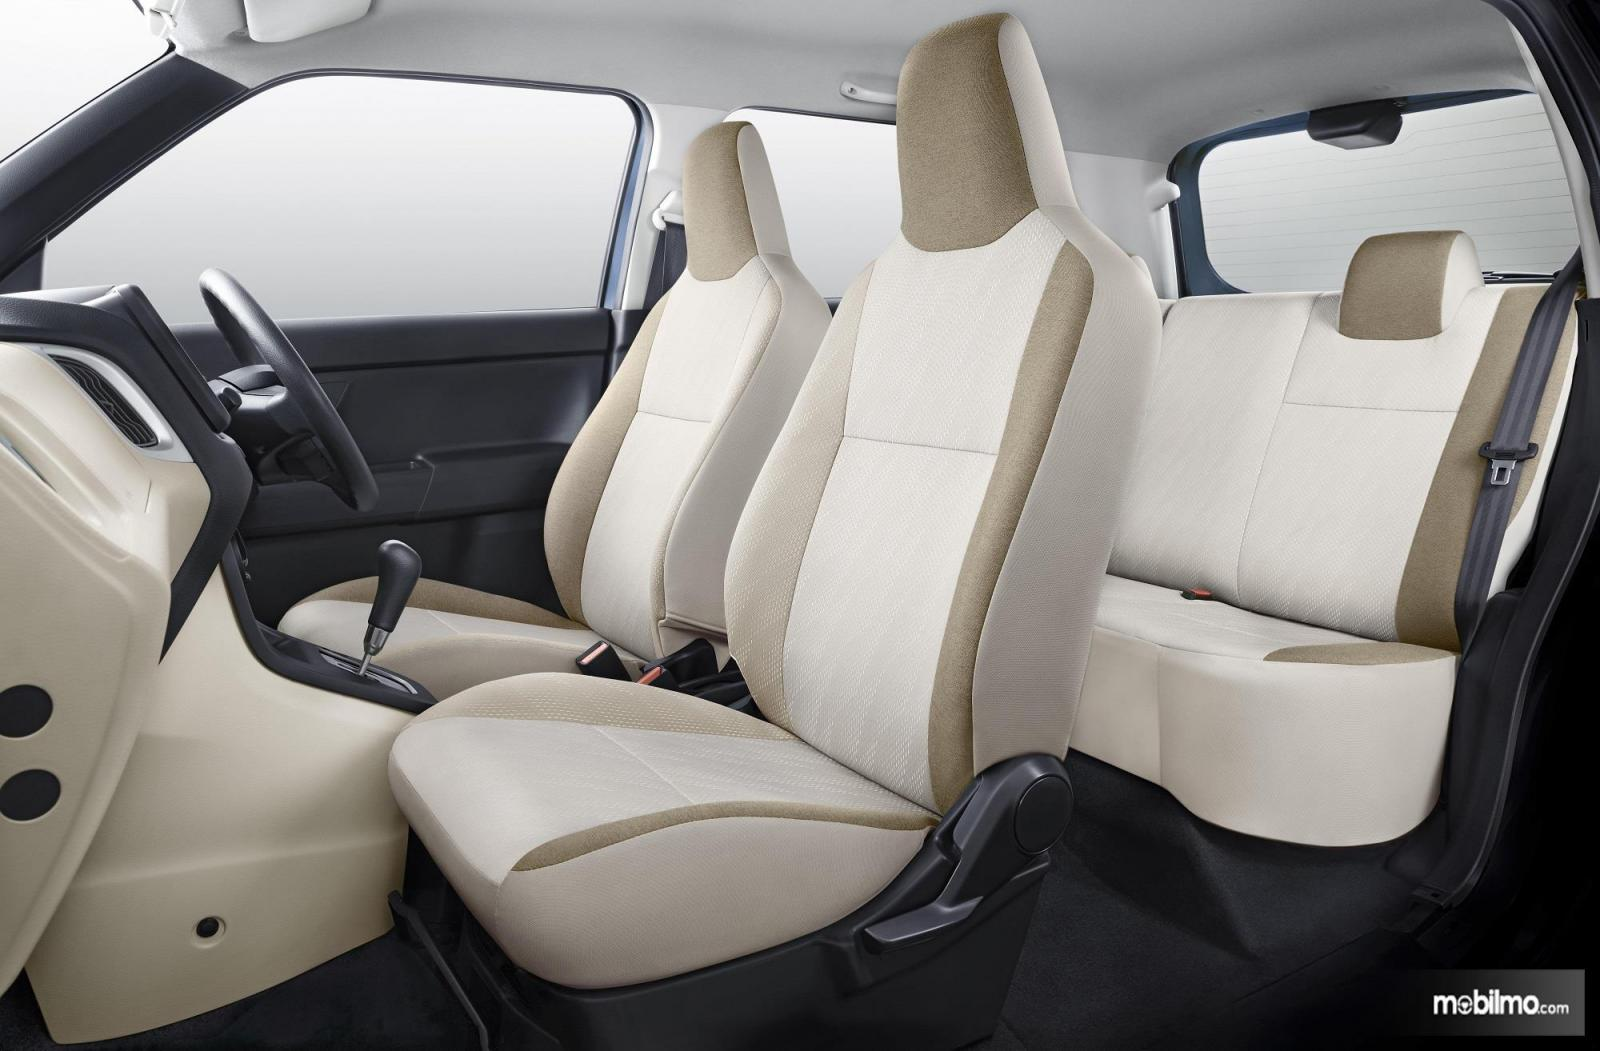 Foto interior Suzuki Wagon R 2019, kok tampak bersih